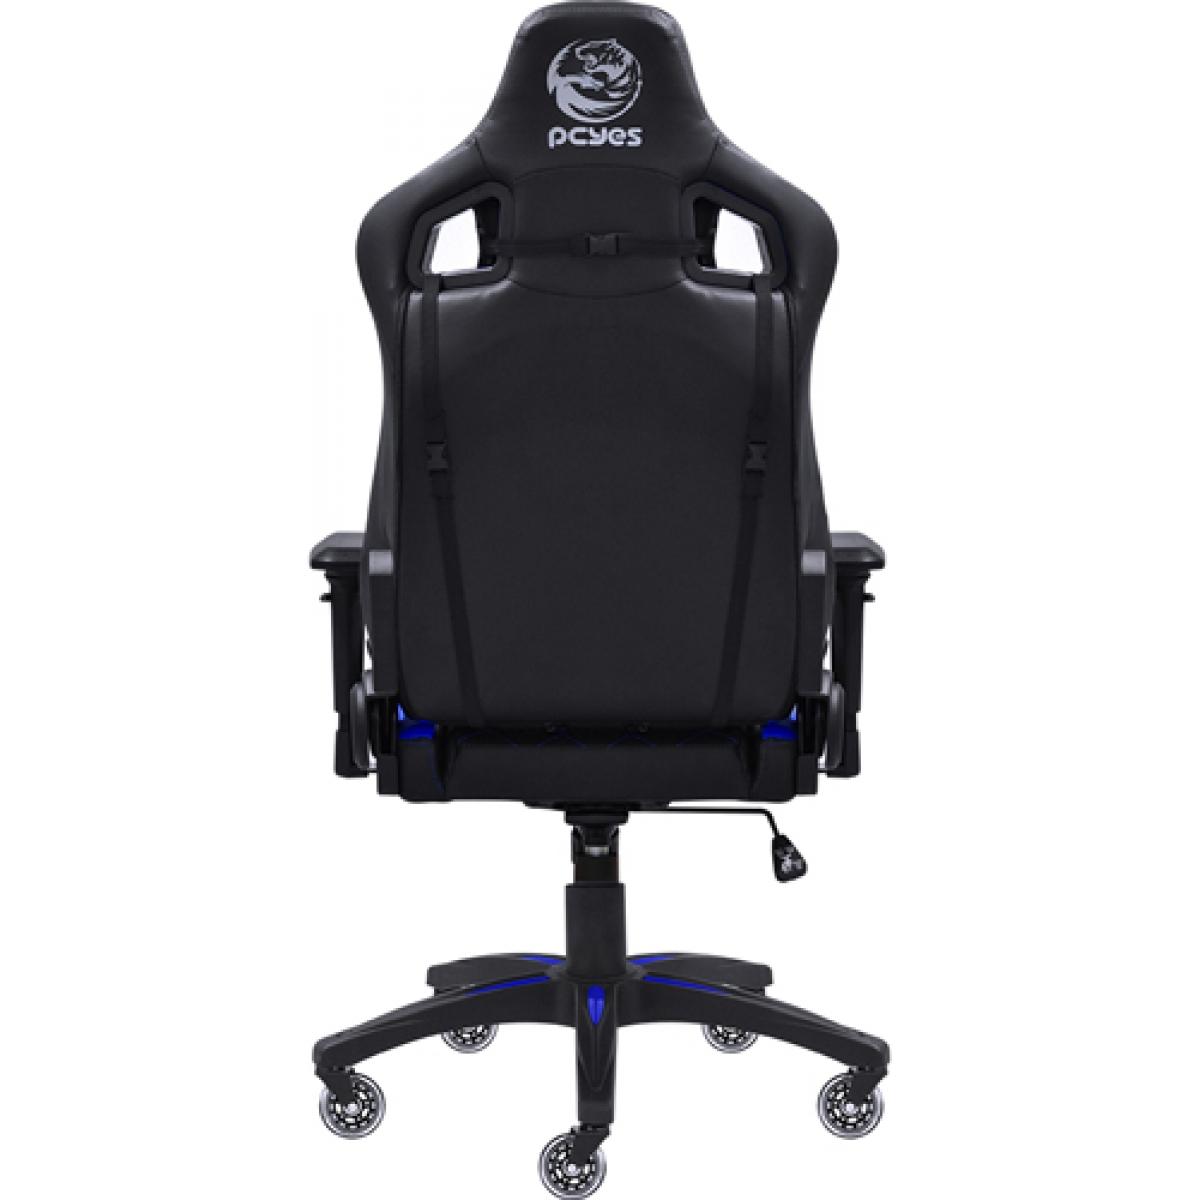 Cadeira Gamer PCYes Mad Racer V10, Black-Blue, MADV10AZGL